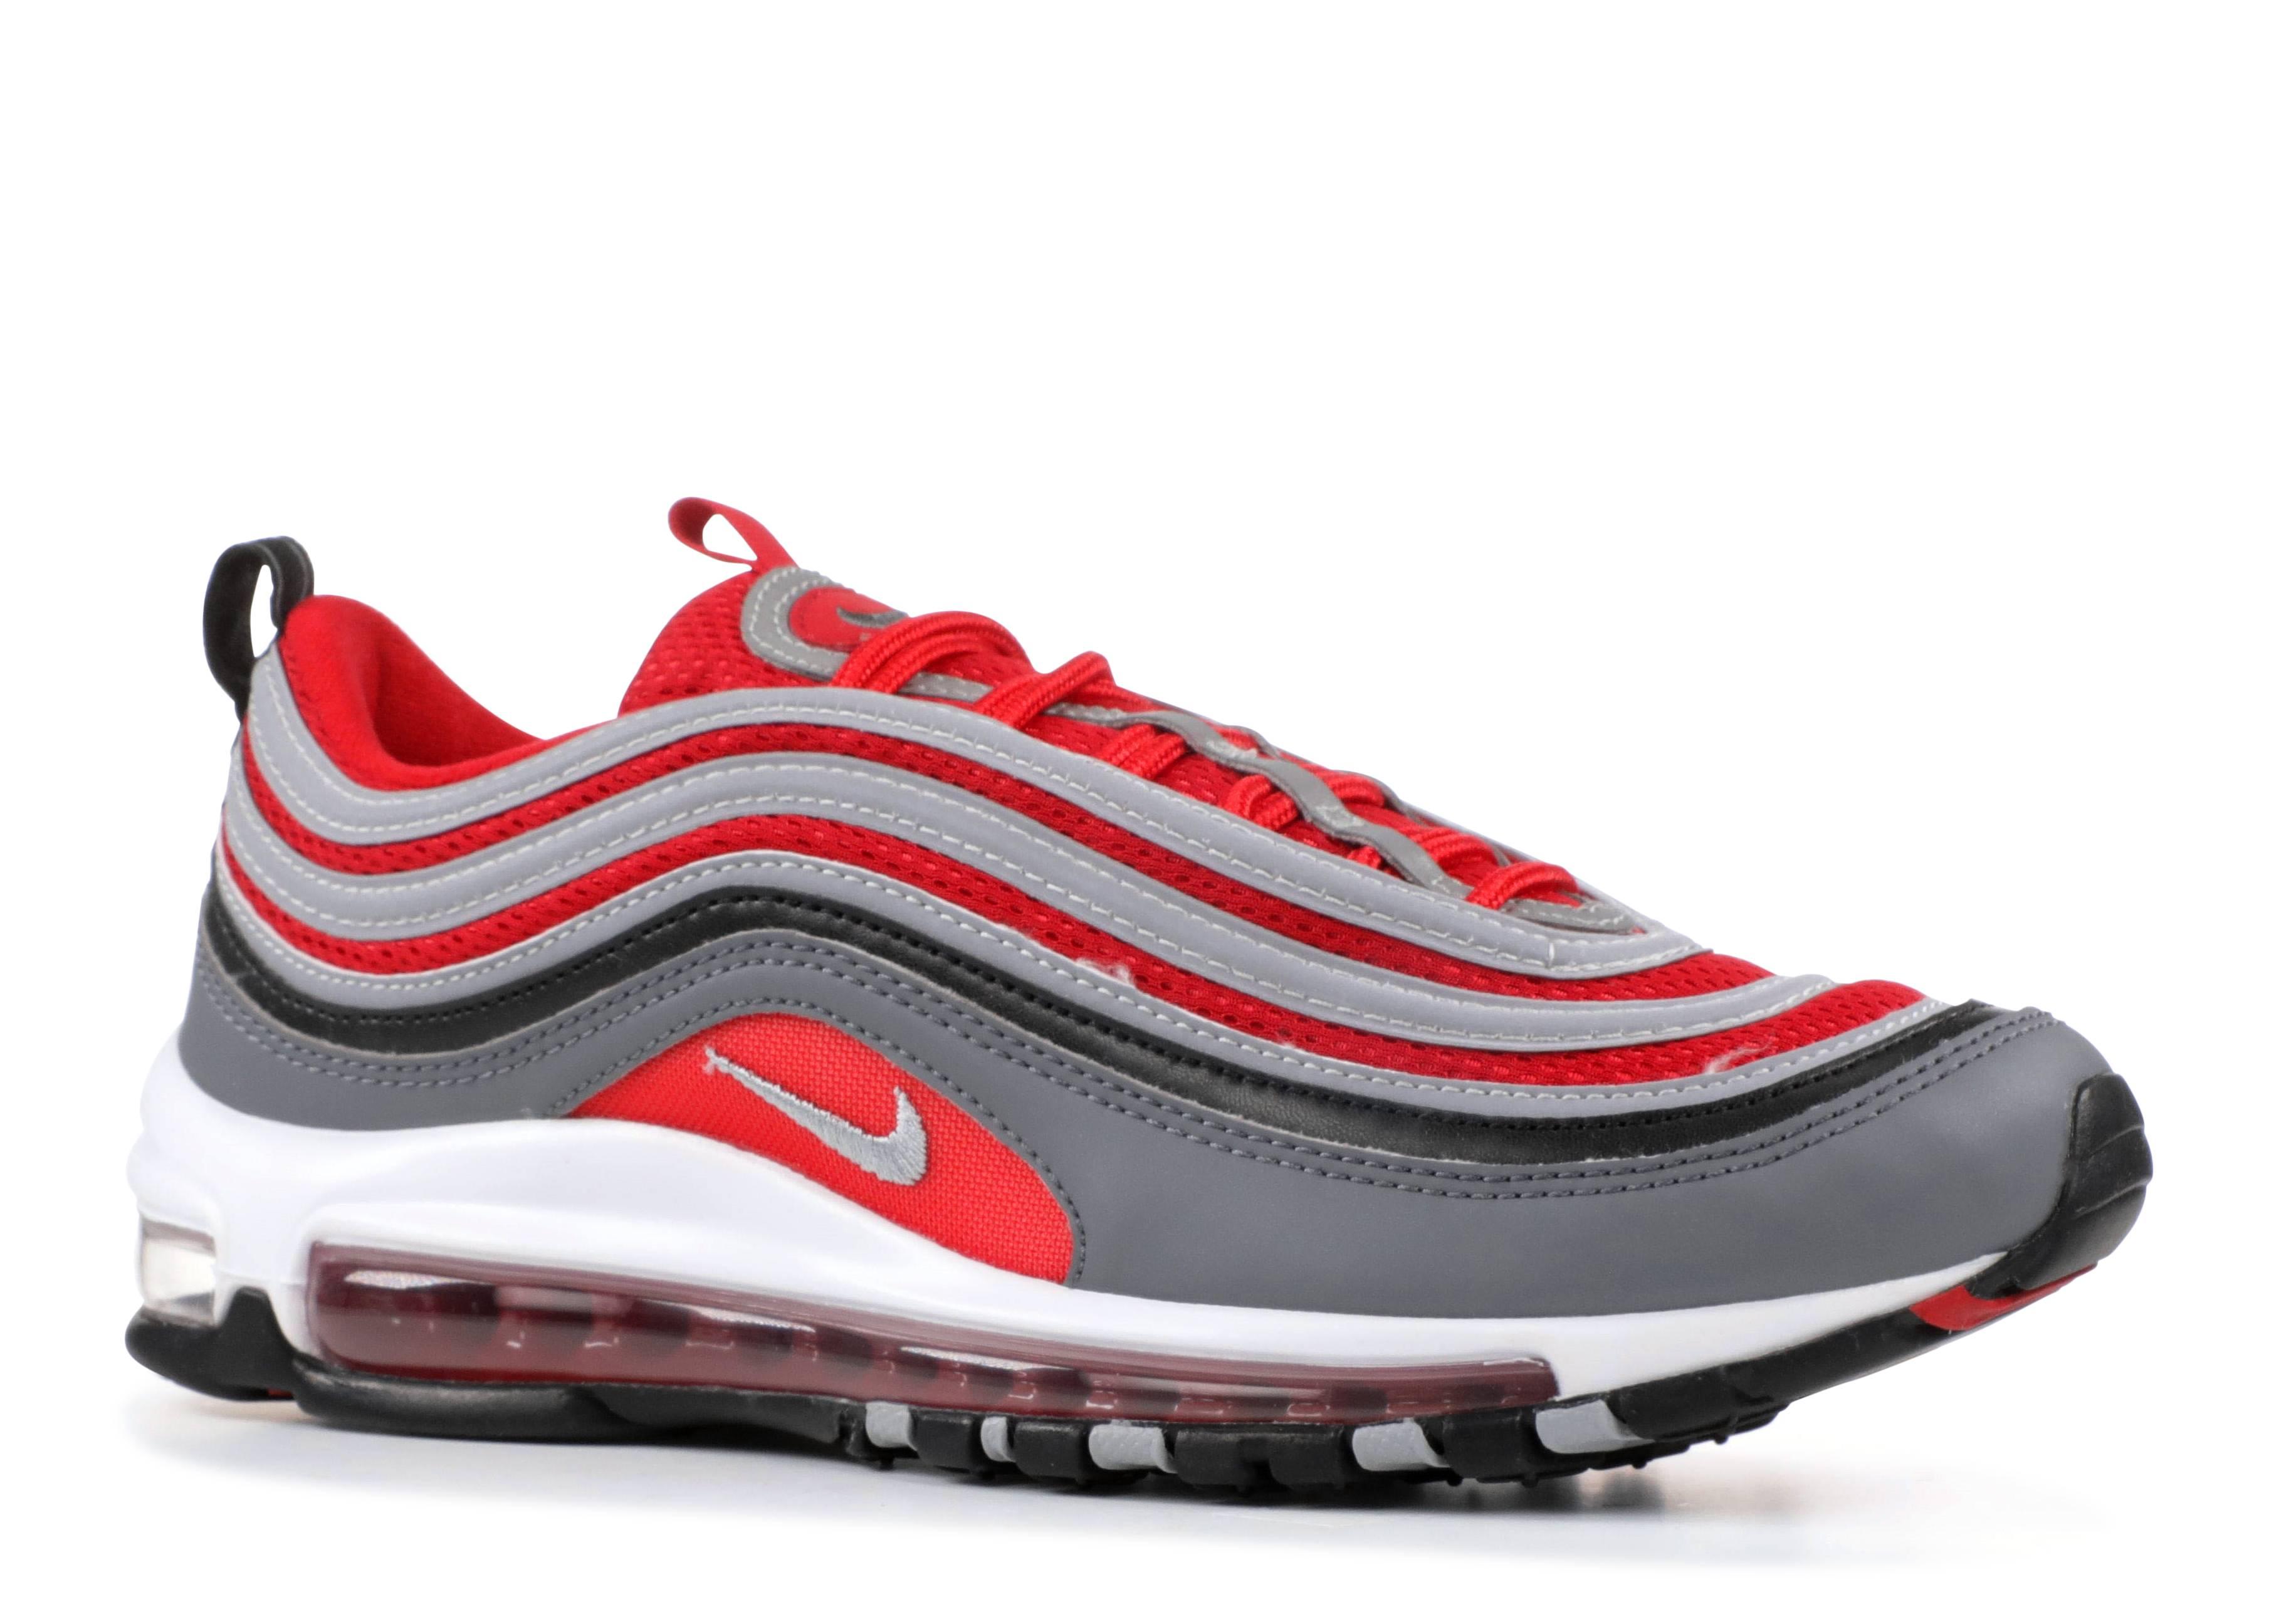 Air Max 97 'Gym Red'